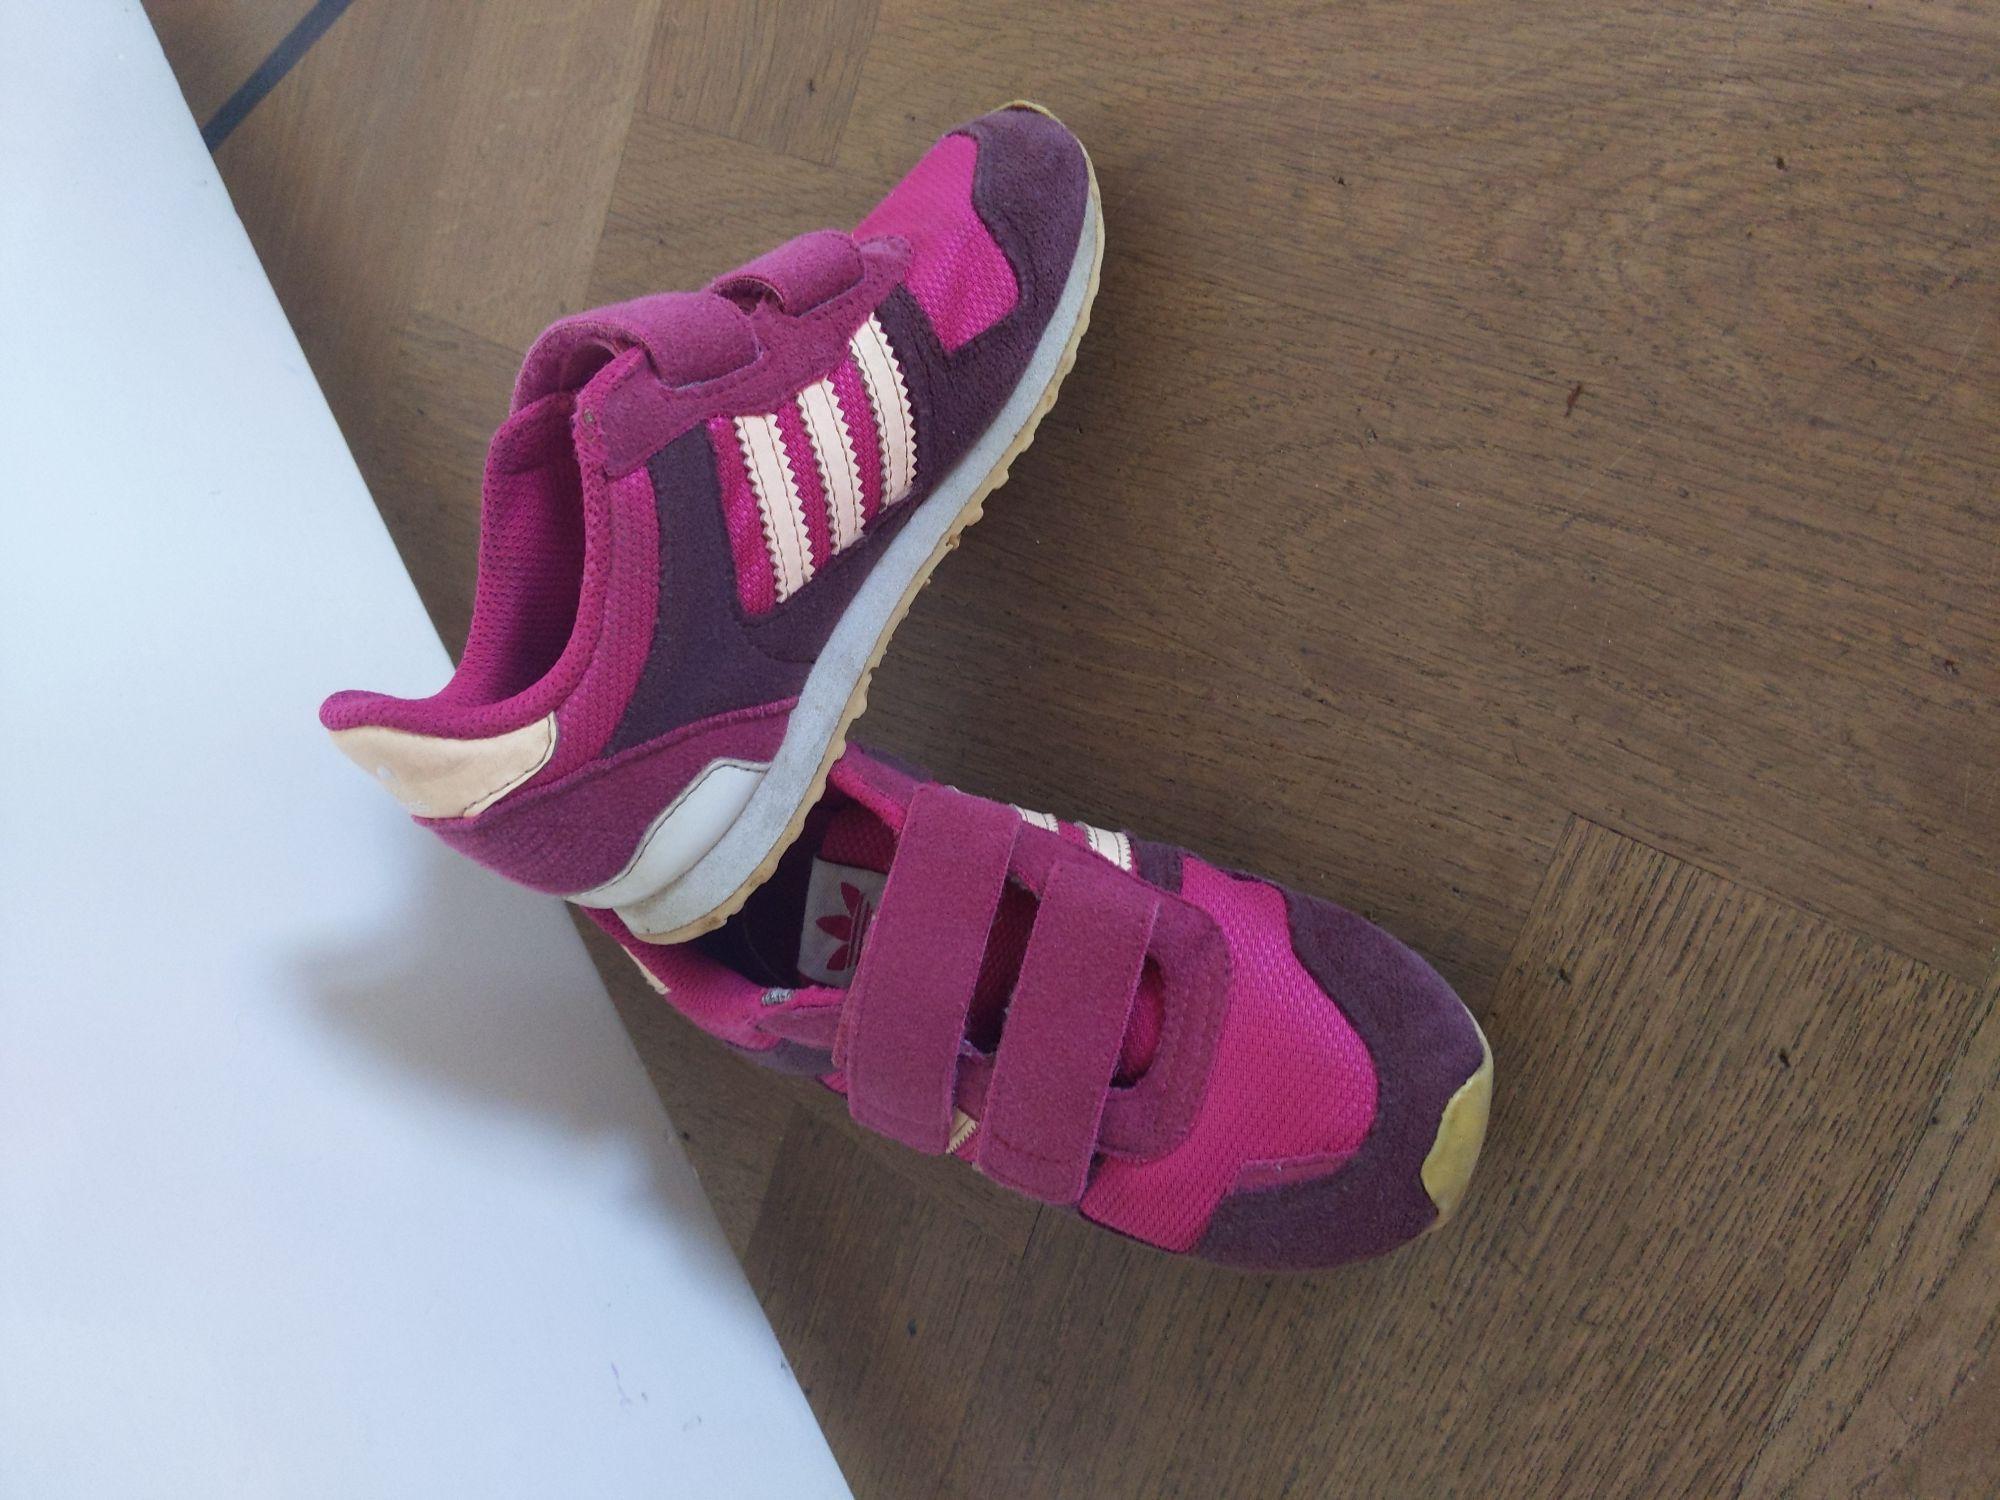 Roze Adidas gympjes